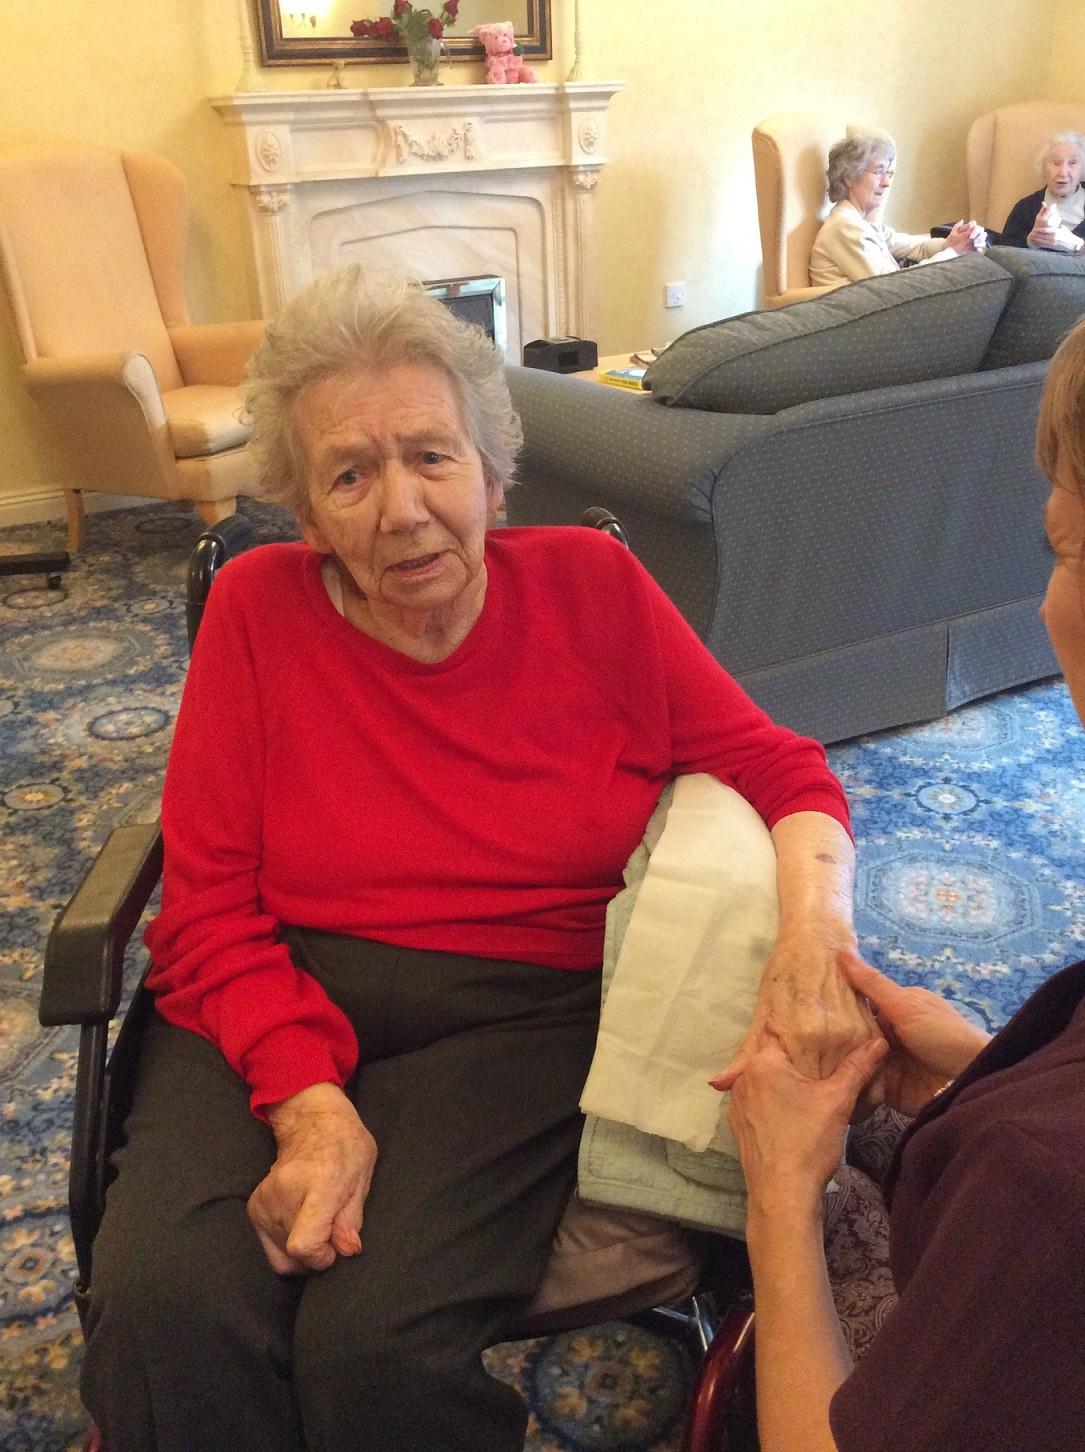 Jean enjoying her aromatherapy hand massage